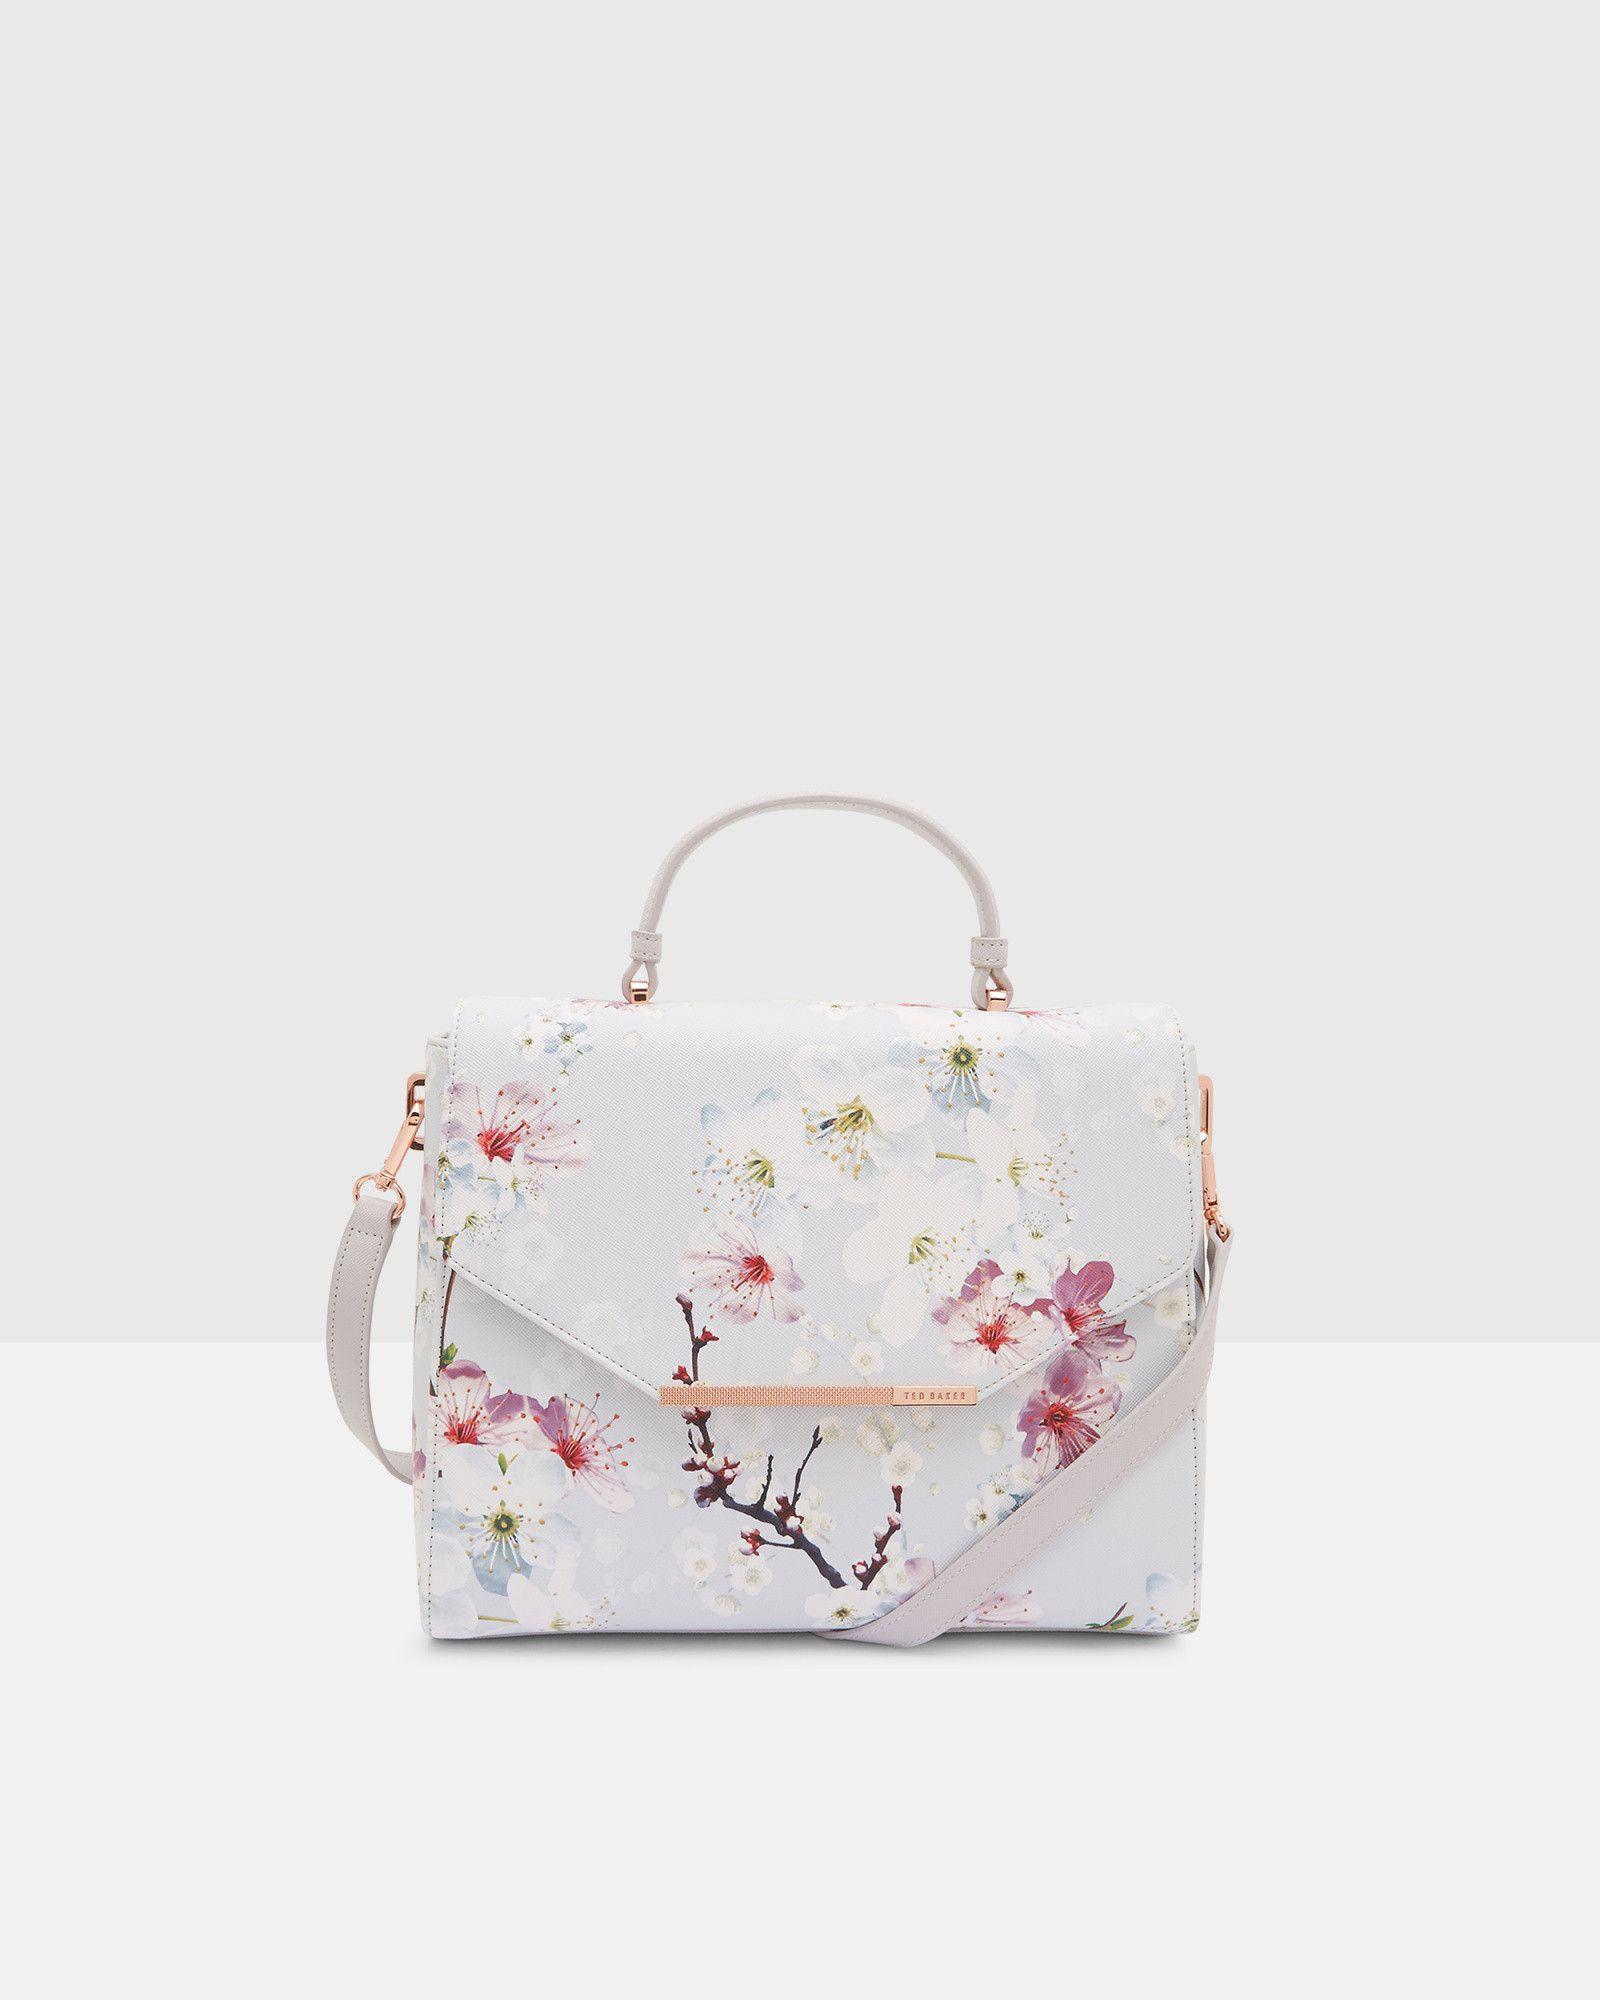 ee6f92956e0 Oriental Blossom tote bag - Light Gray | Bags | Ted Baker | Bag ...